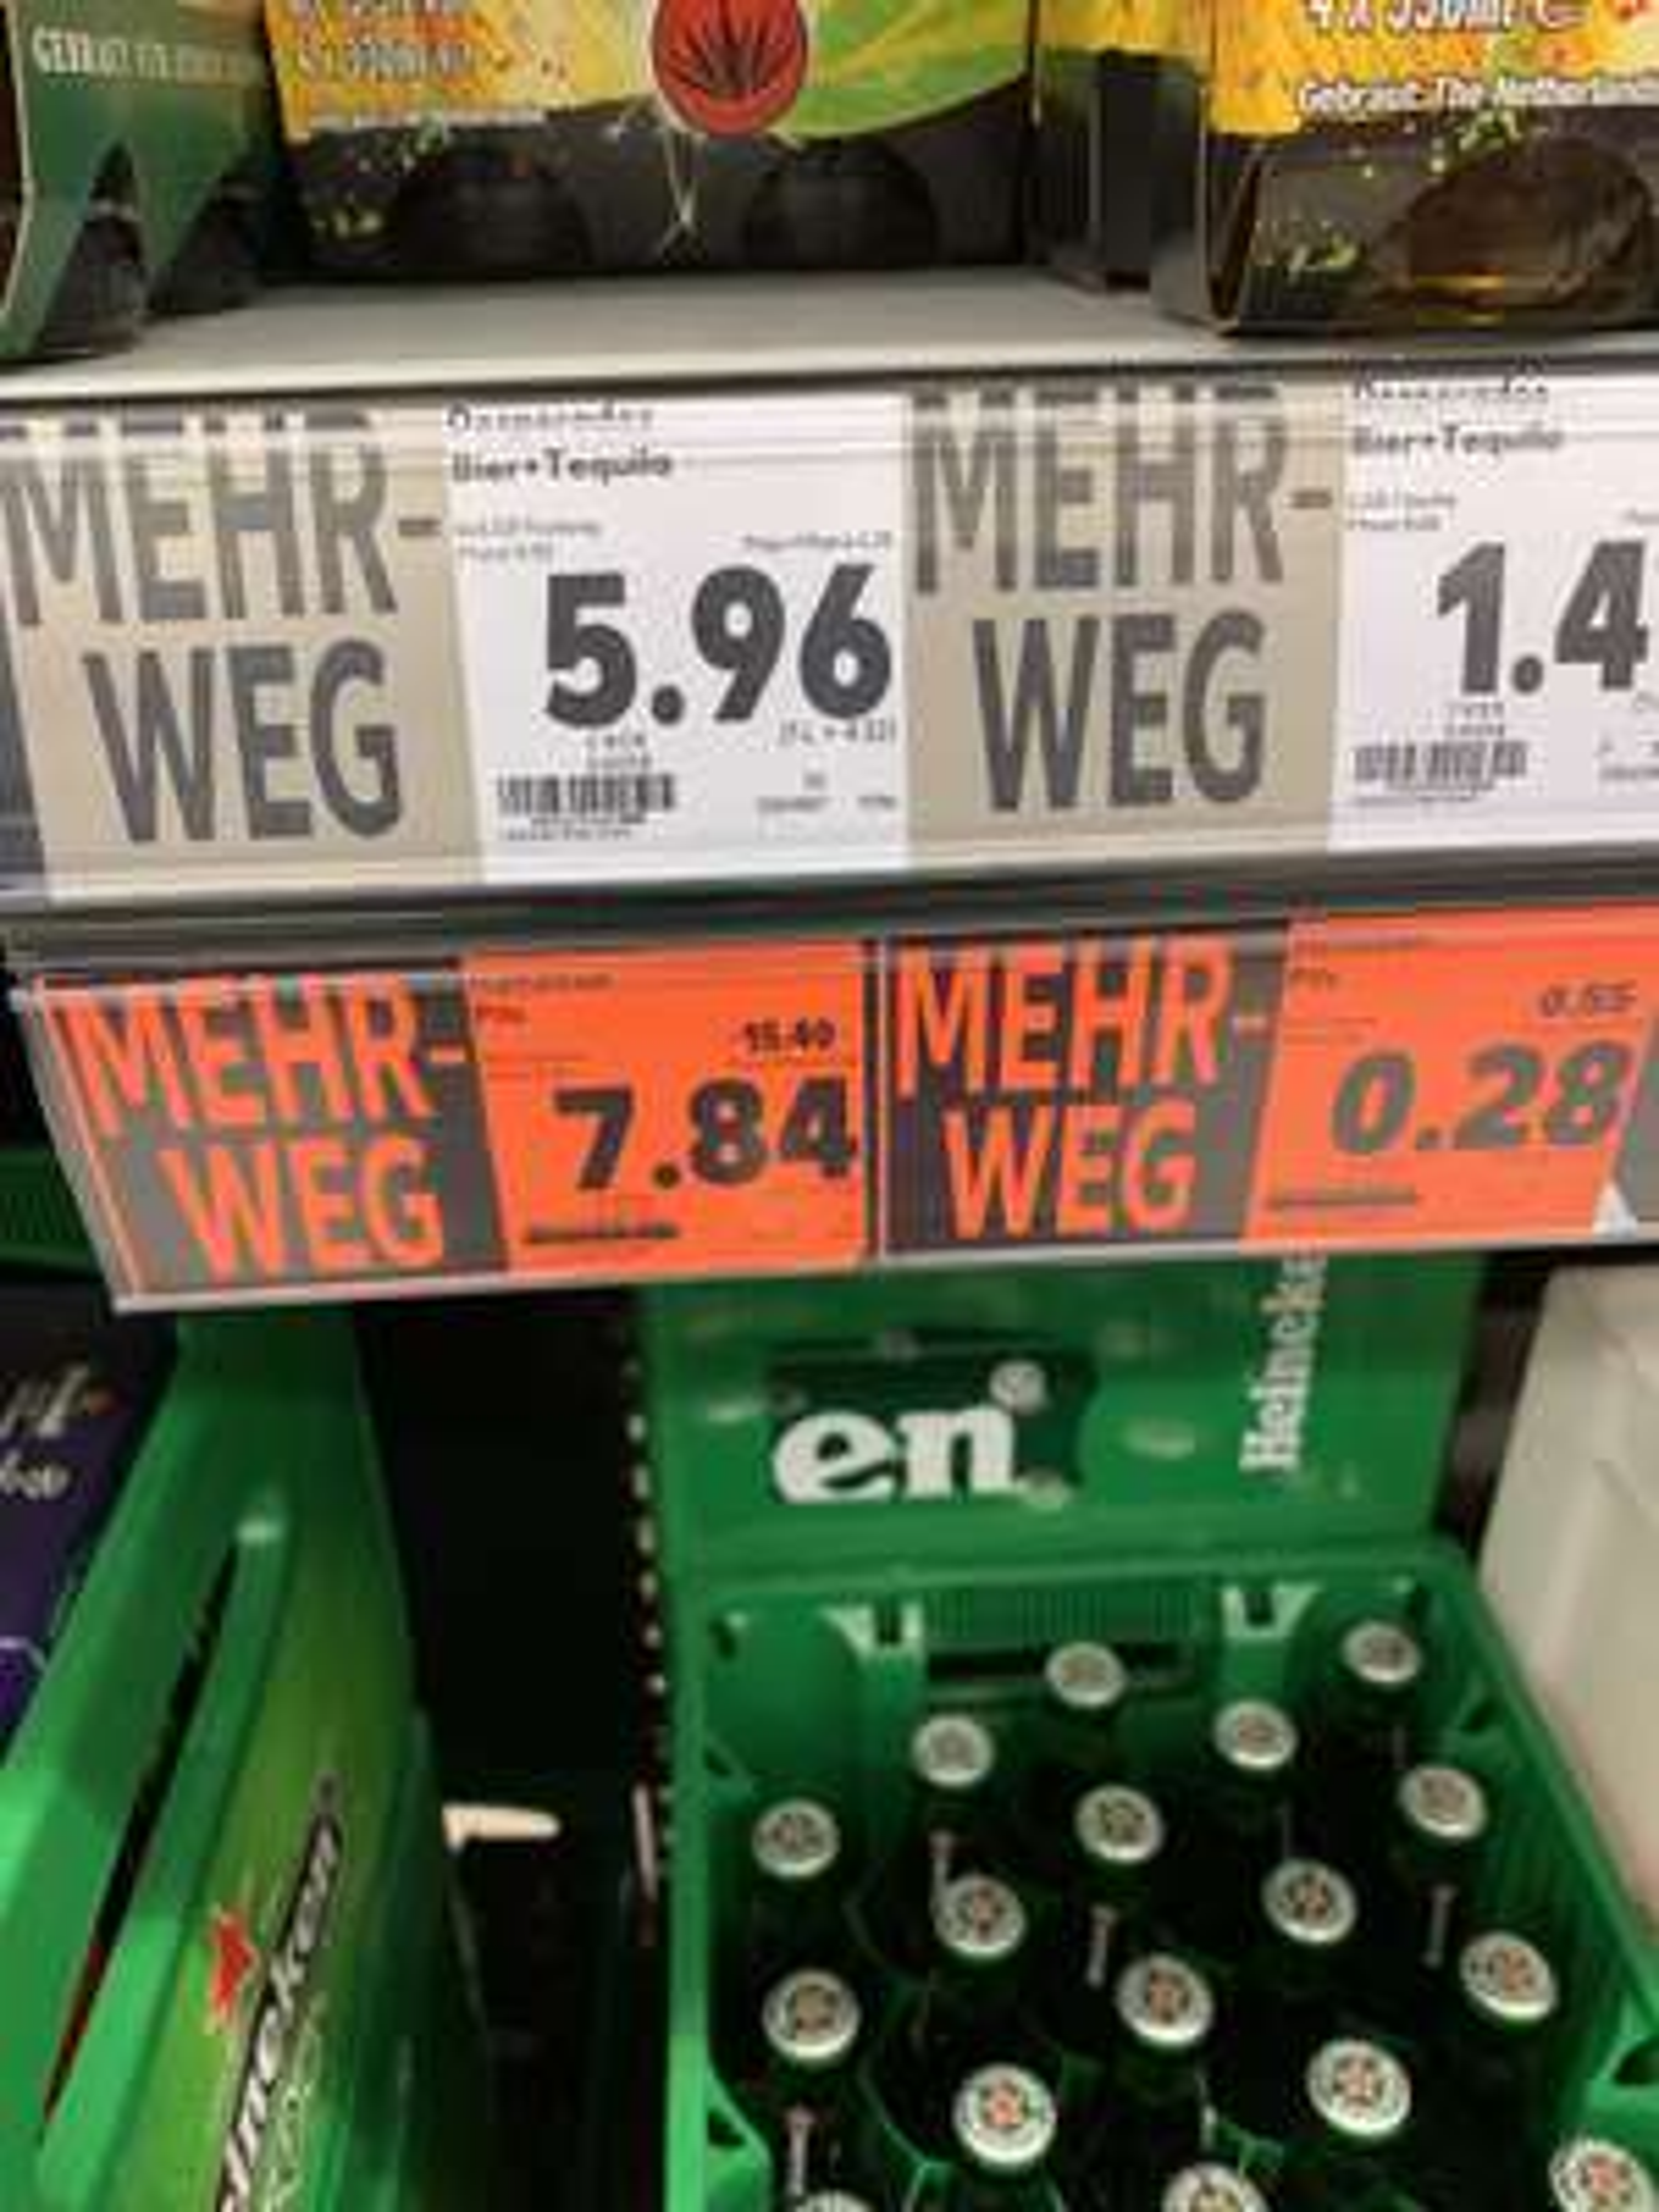 Heineken 0,25 / Lokal Hannover HBF